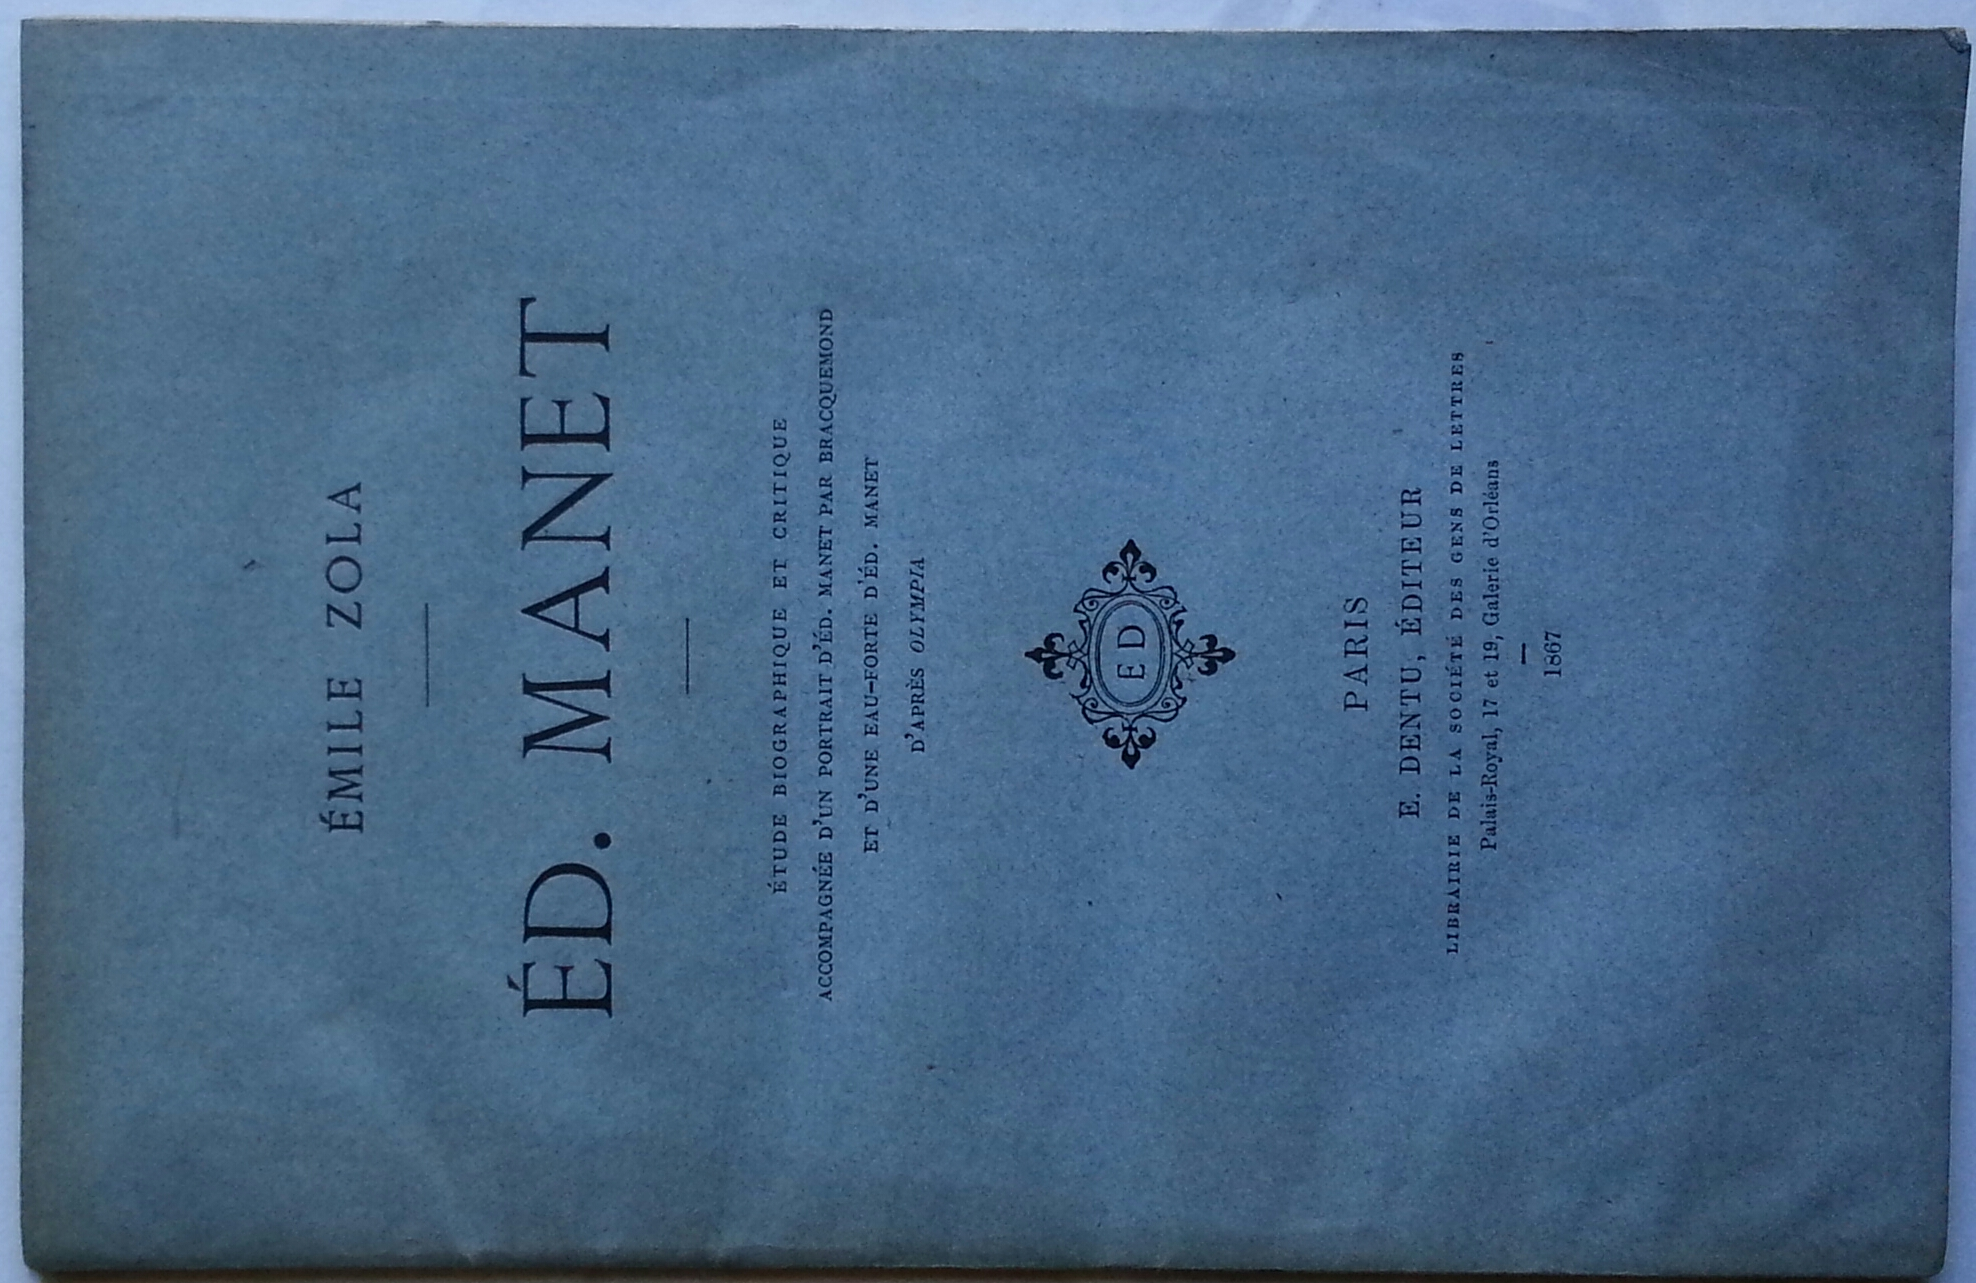 edouard manet olympia essay Manet edourd manet manet, monet comparison essay the french painter edouard manet views of modern man manet - still life manet's olympia.